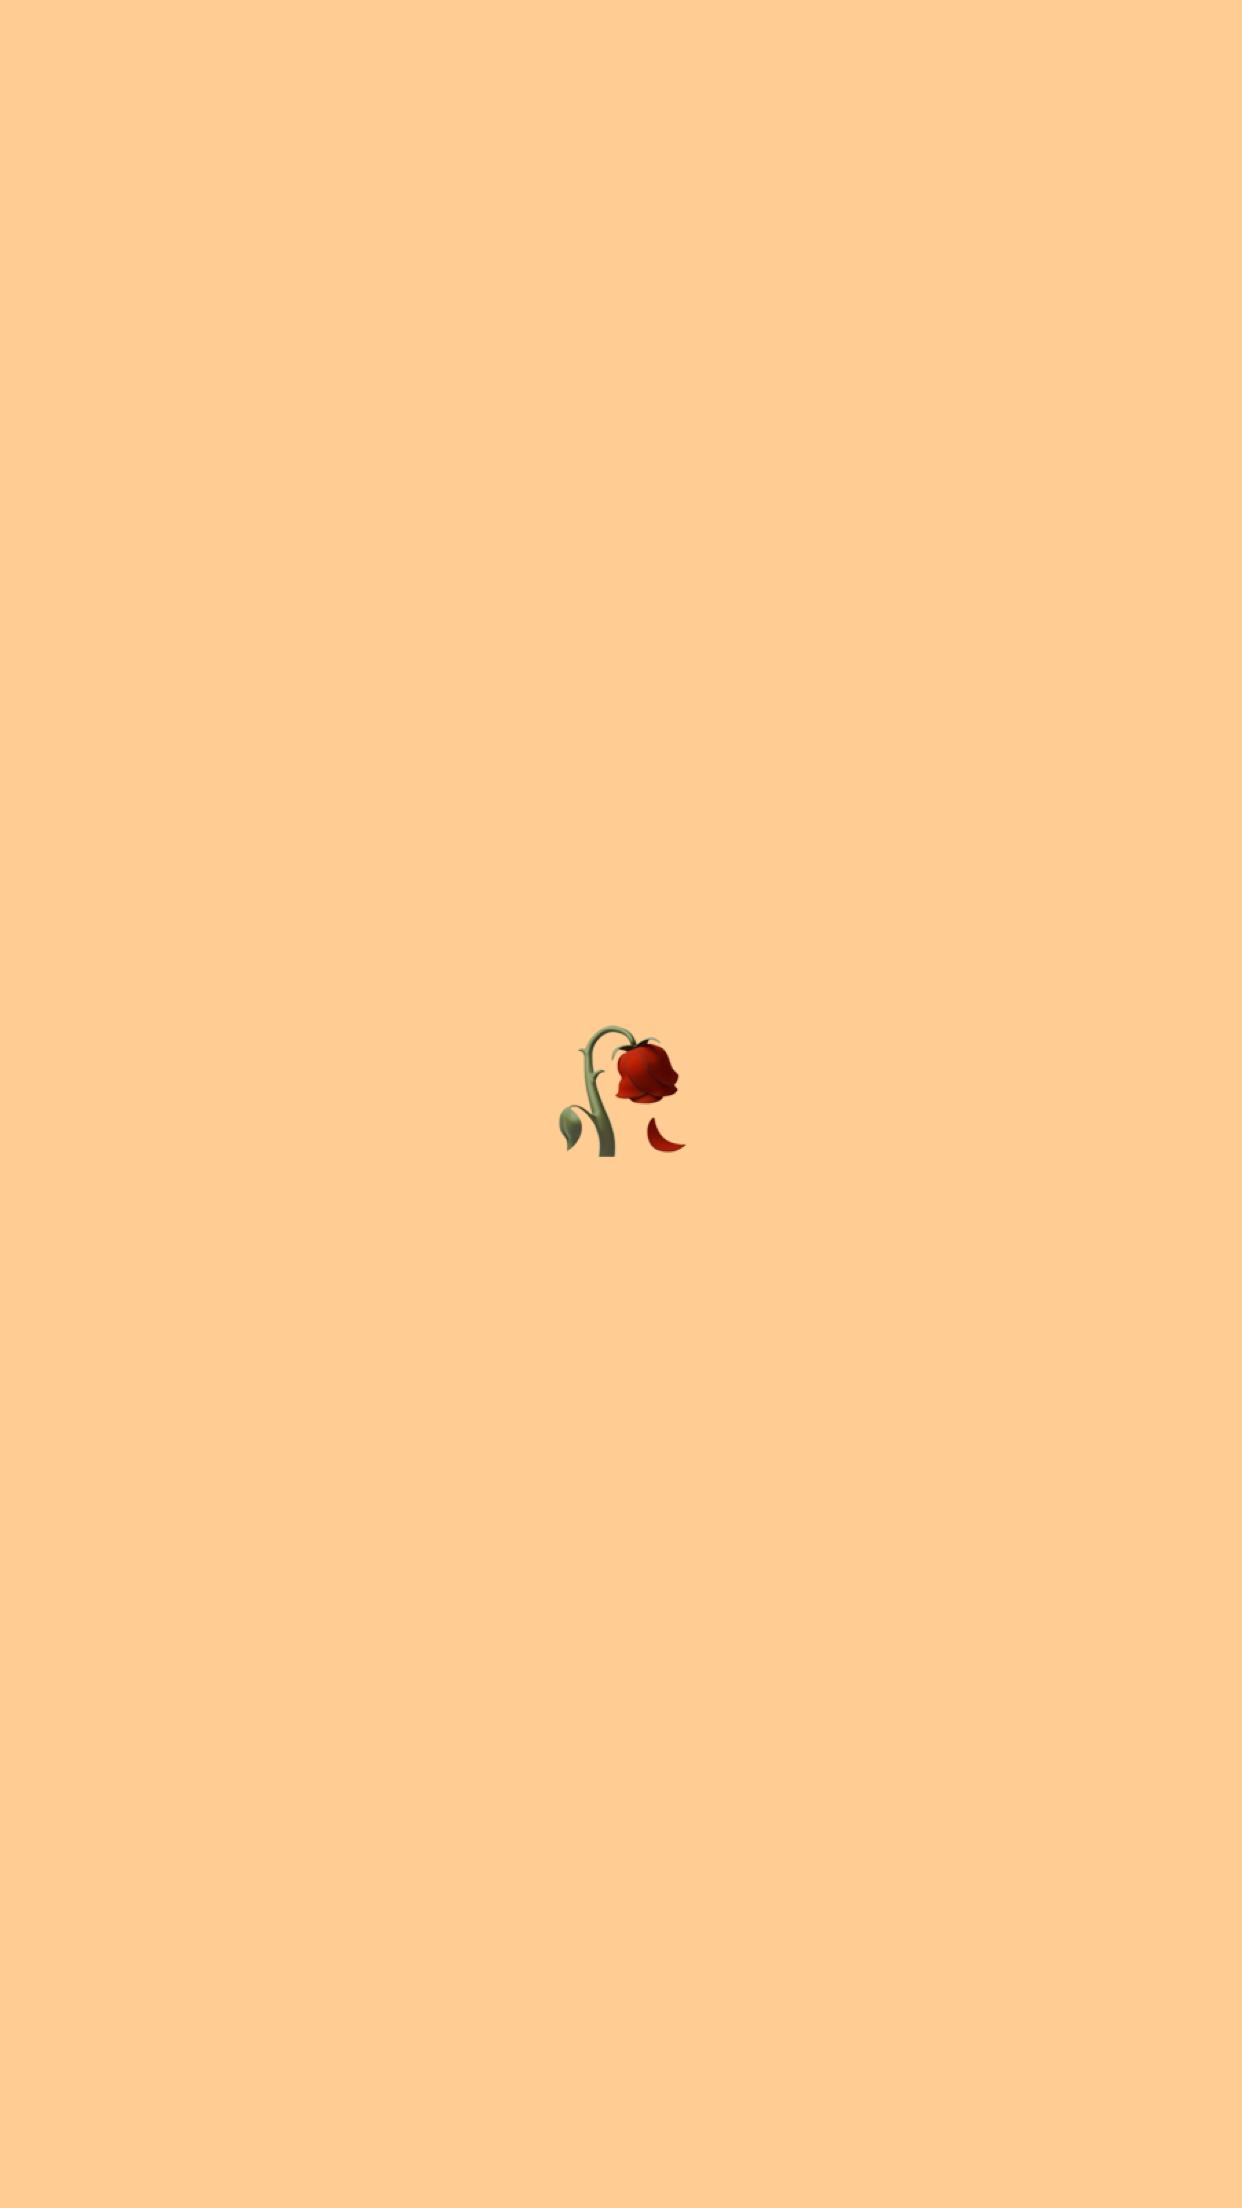 Rose Emoji Background Emoji Wallpaper Iphone Sad Wallpaper